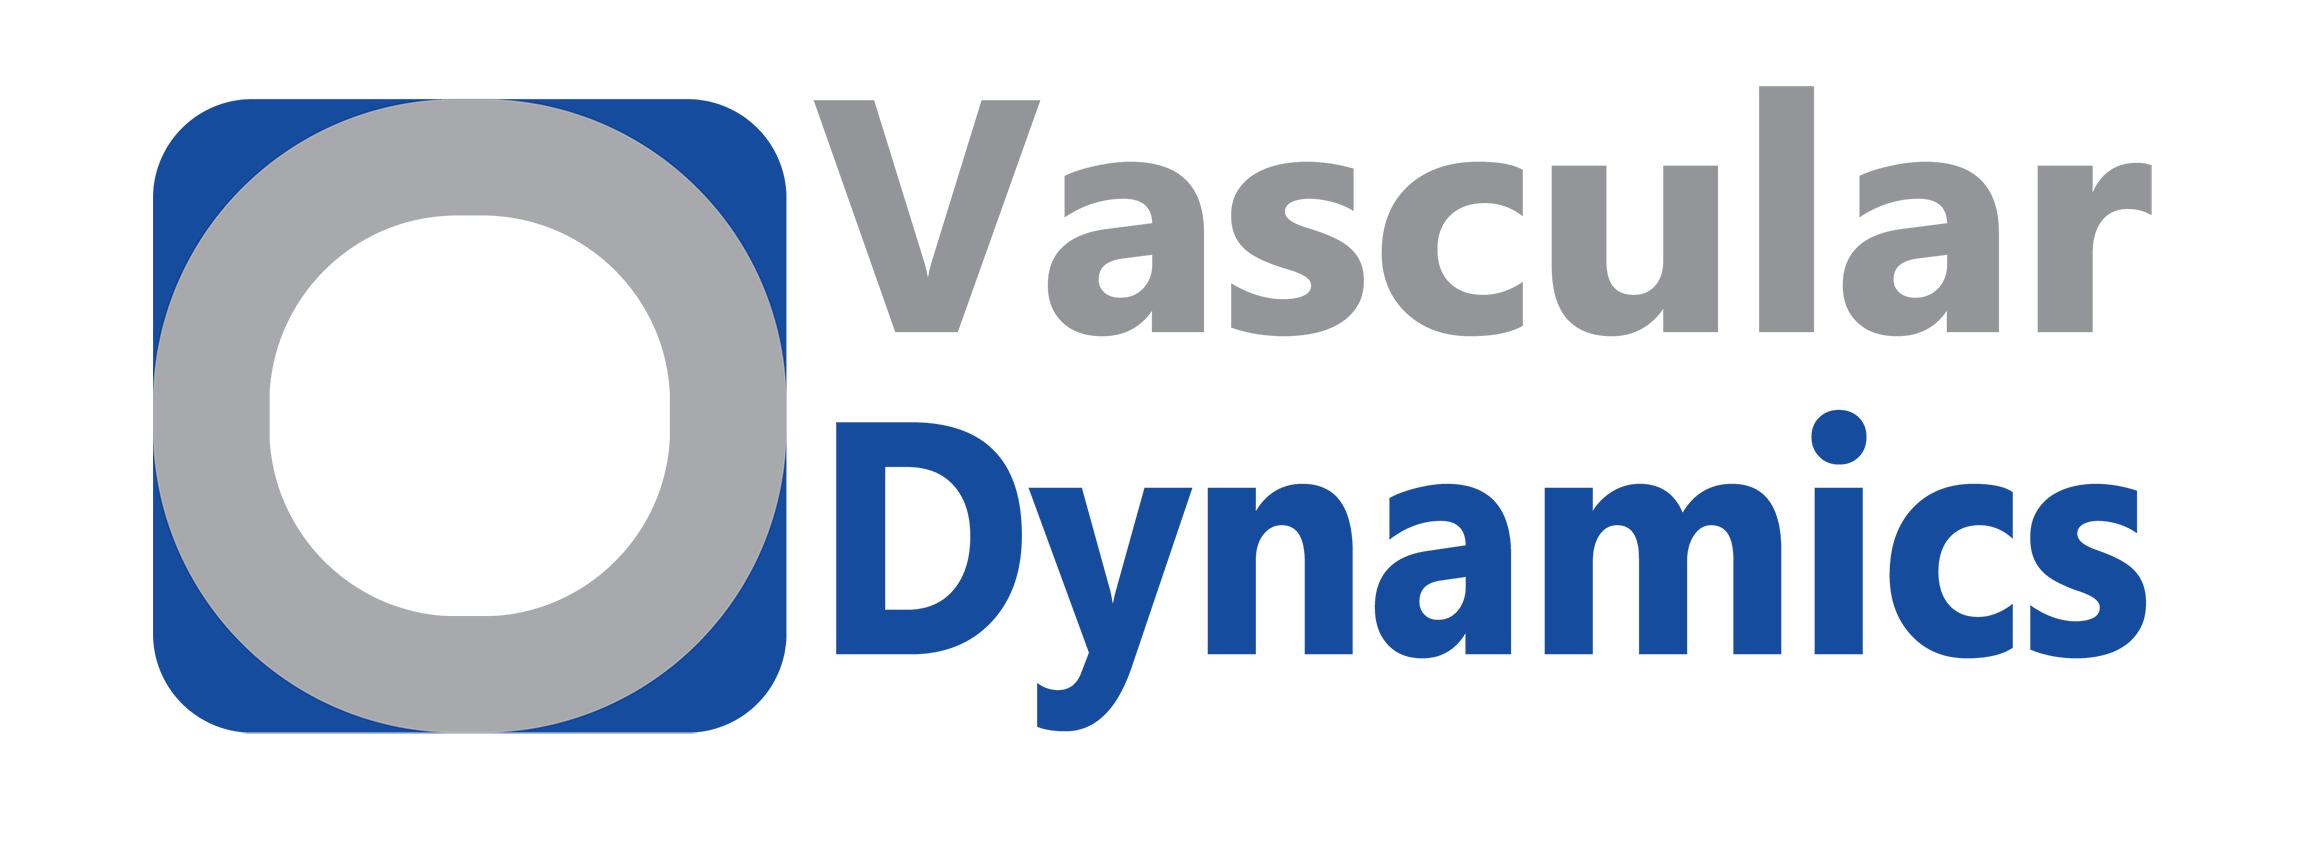 Vascular Dynamics company logo